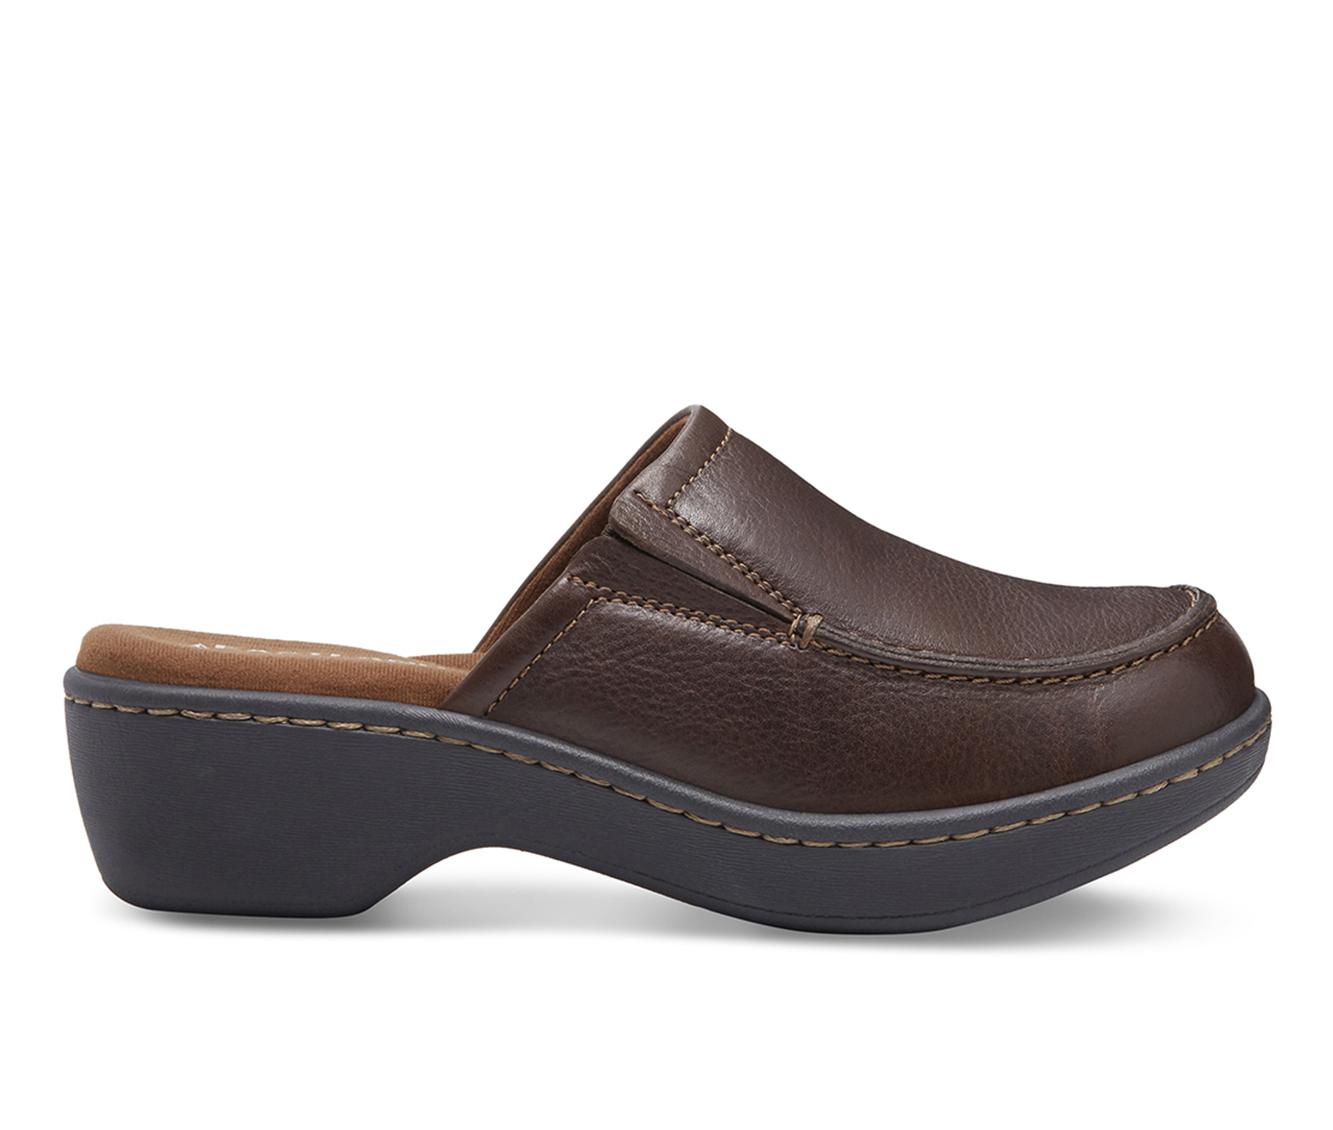 Eastland Georgia Women's Shoe (Brown Leather)